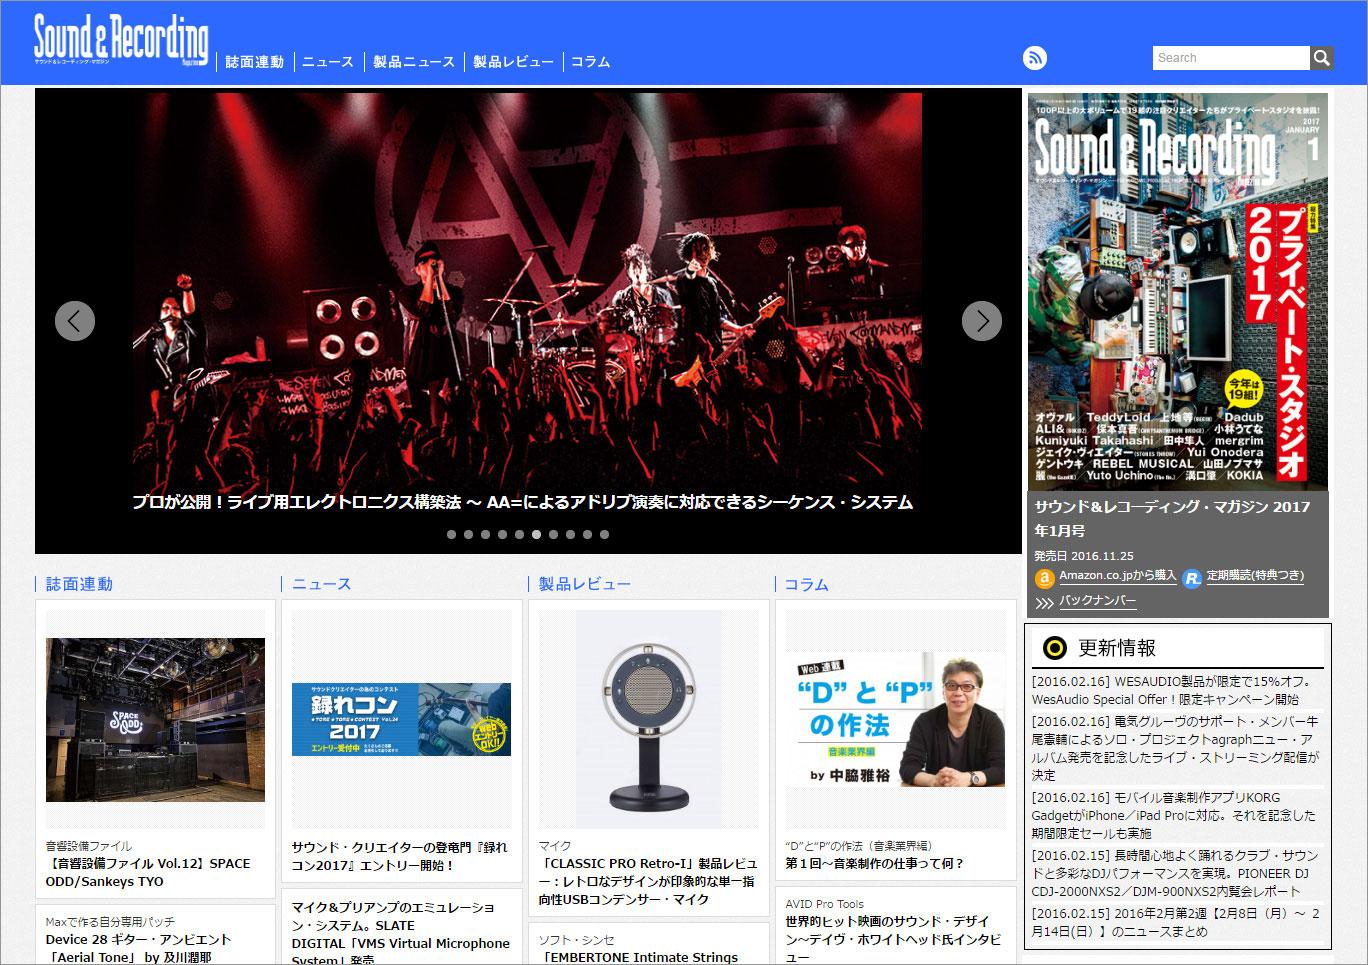 WEBサイト『サウンド&レコーディング・マガジン』